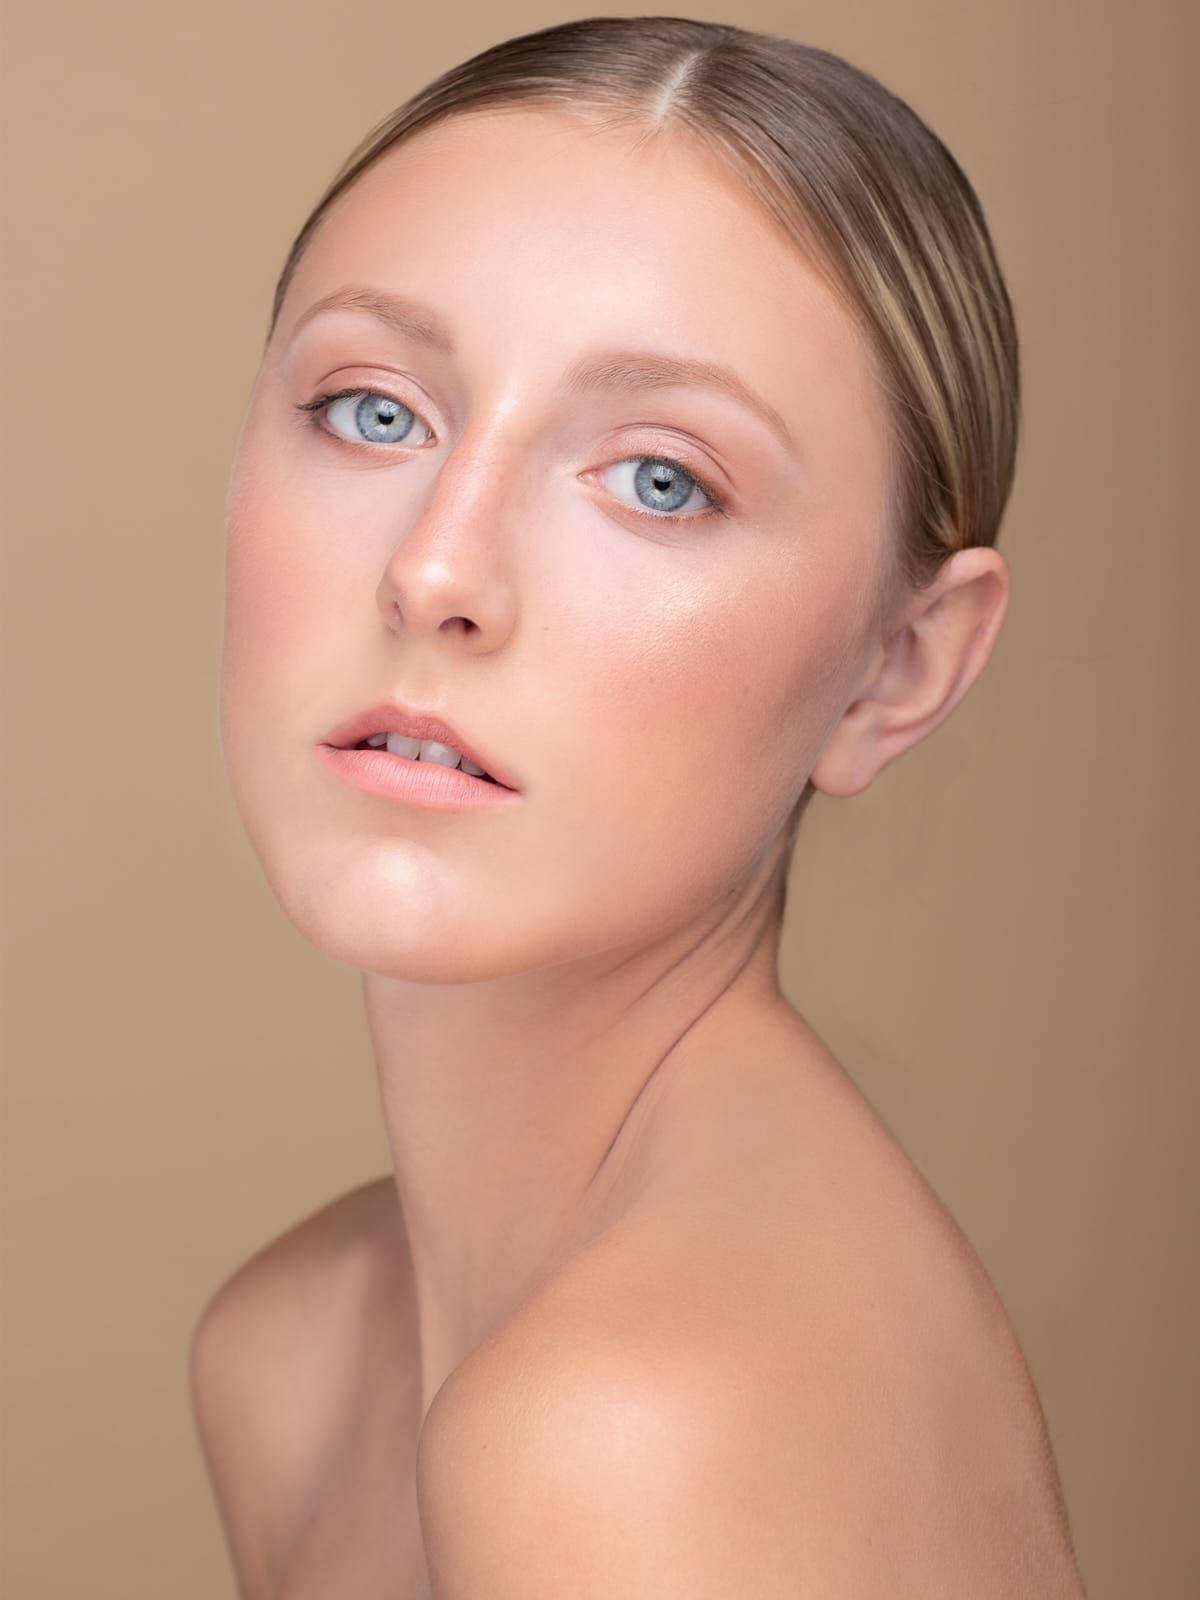 sce-agency-female-model-jordan-g-67